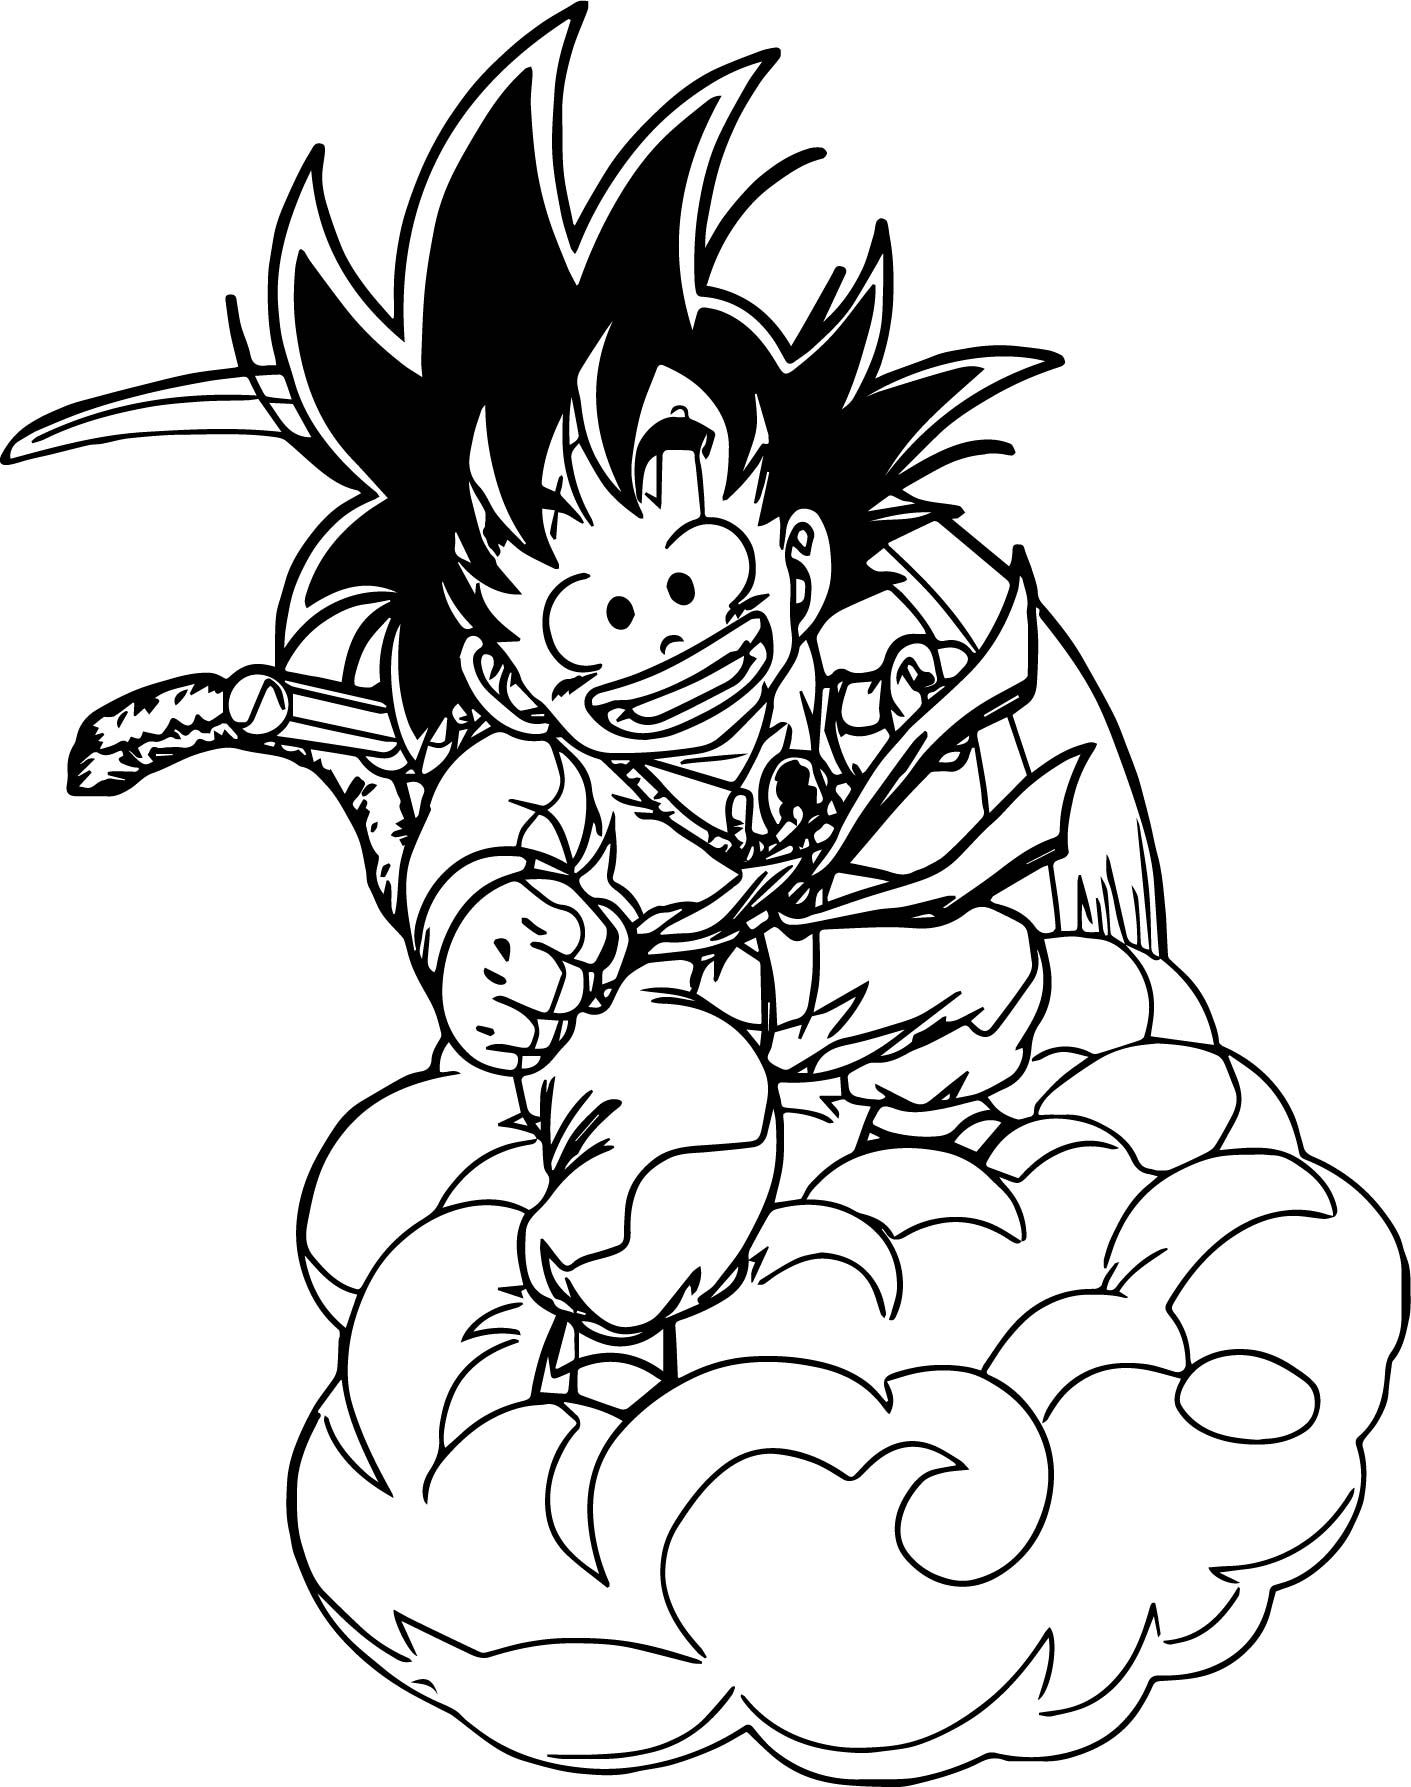 Nice Goku On Cloud Coloring Page Cartoon Coloring Pages Coloring Pages Goku Drawing